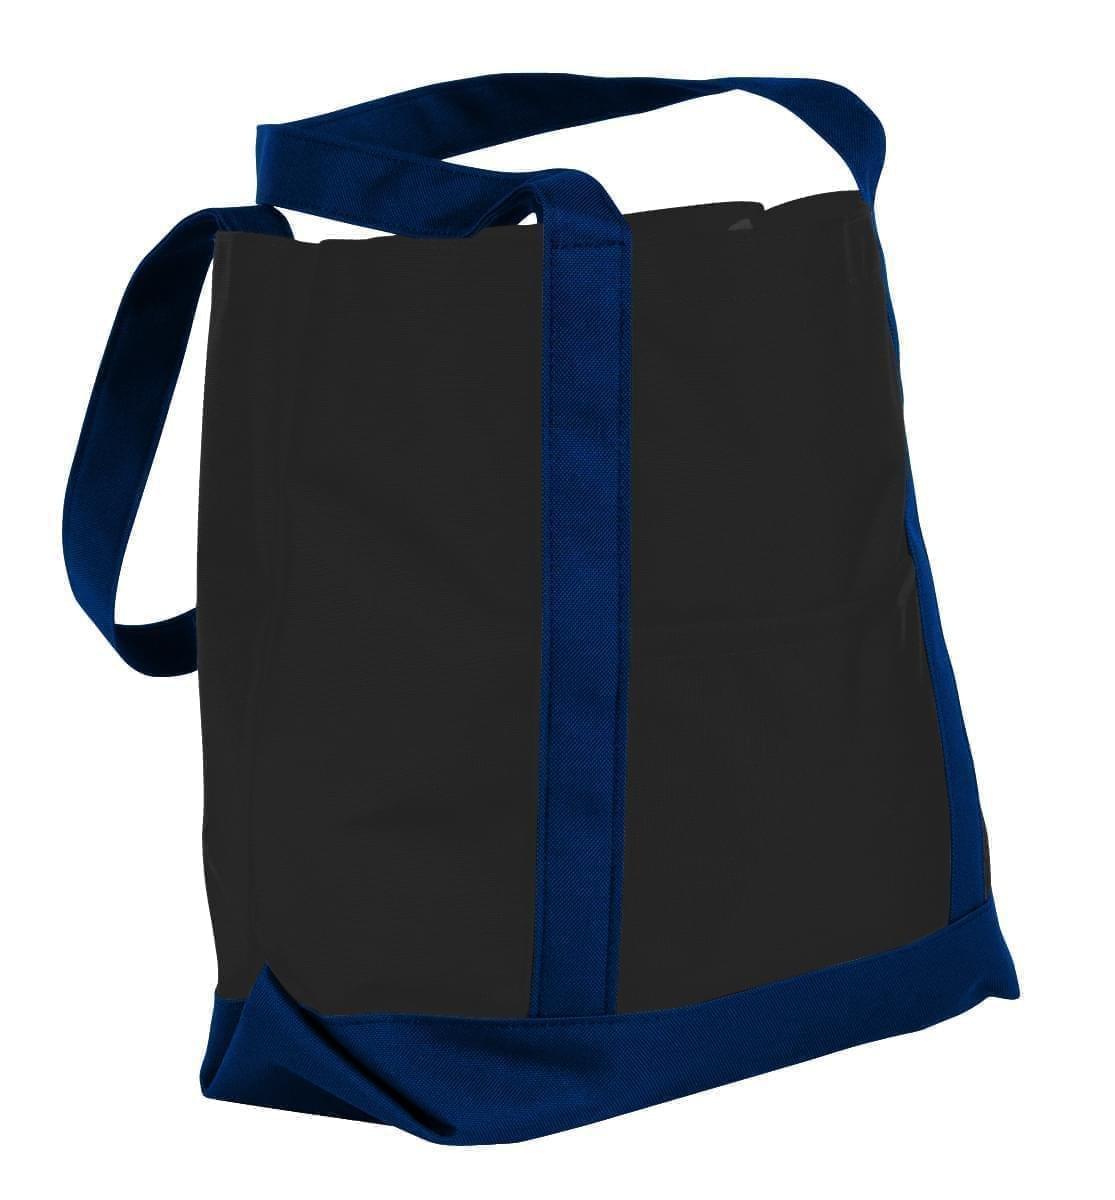 USA Made Nylon Poly Boat Tote Bags, Black-Navy, XAACL1UAOI